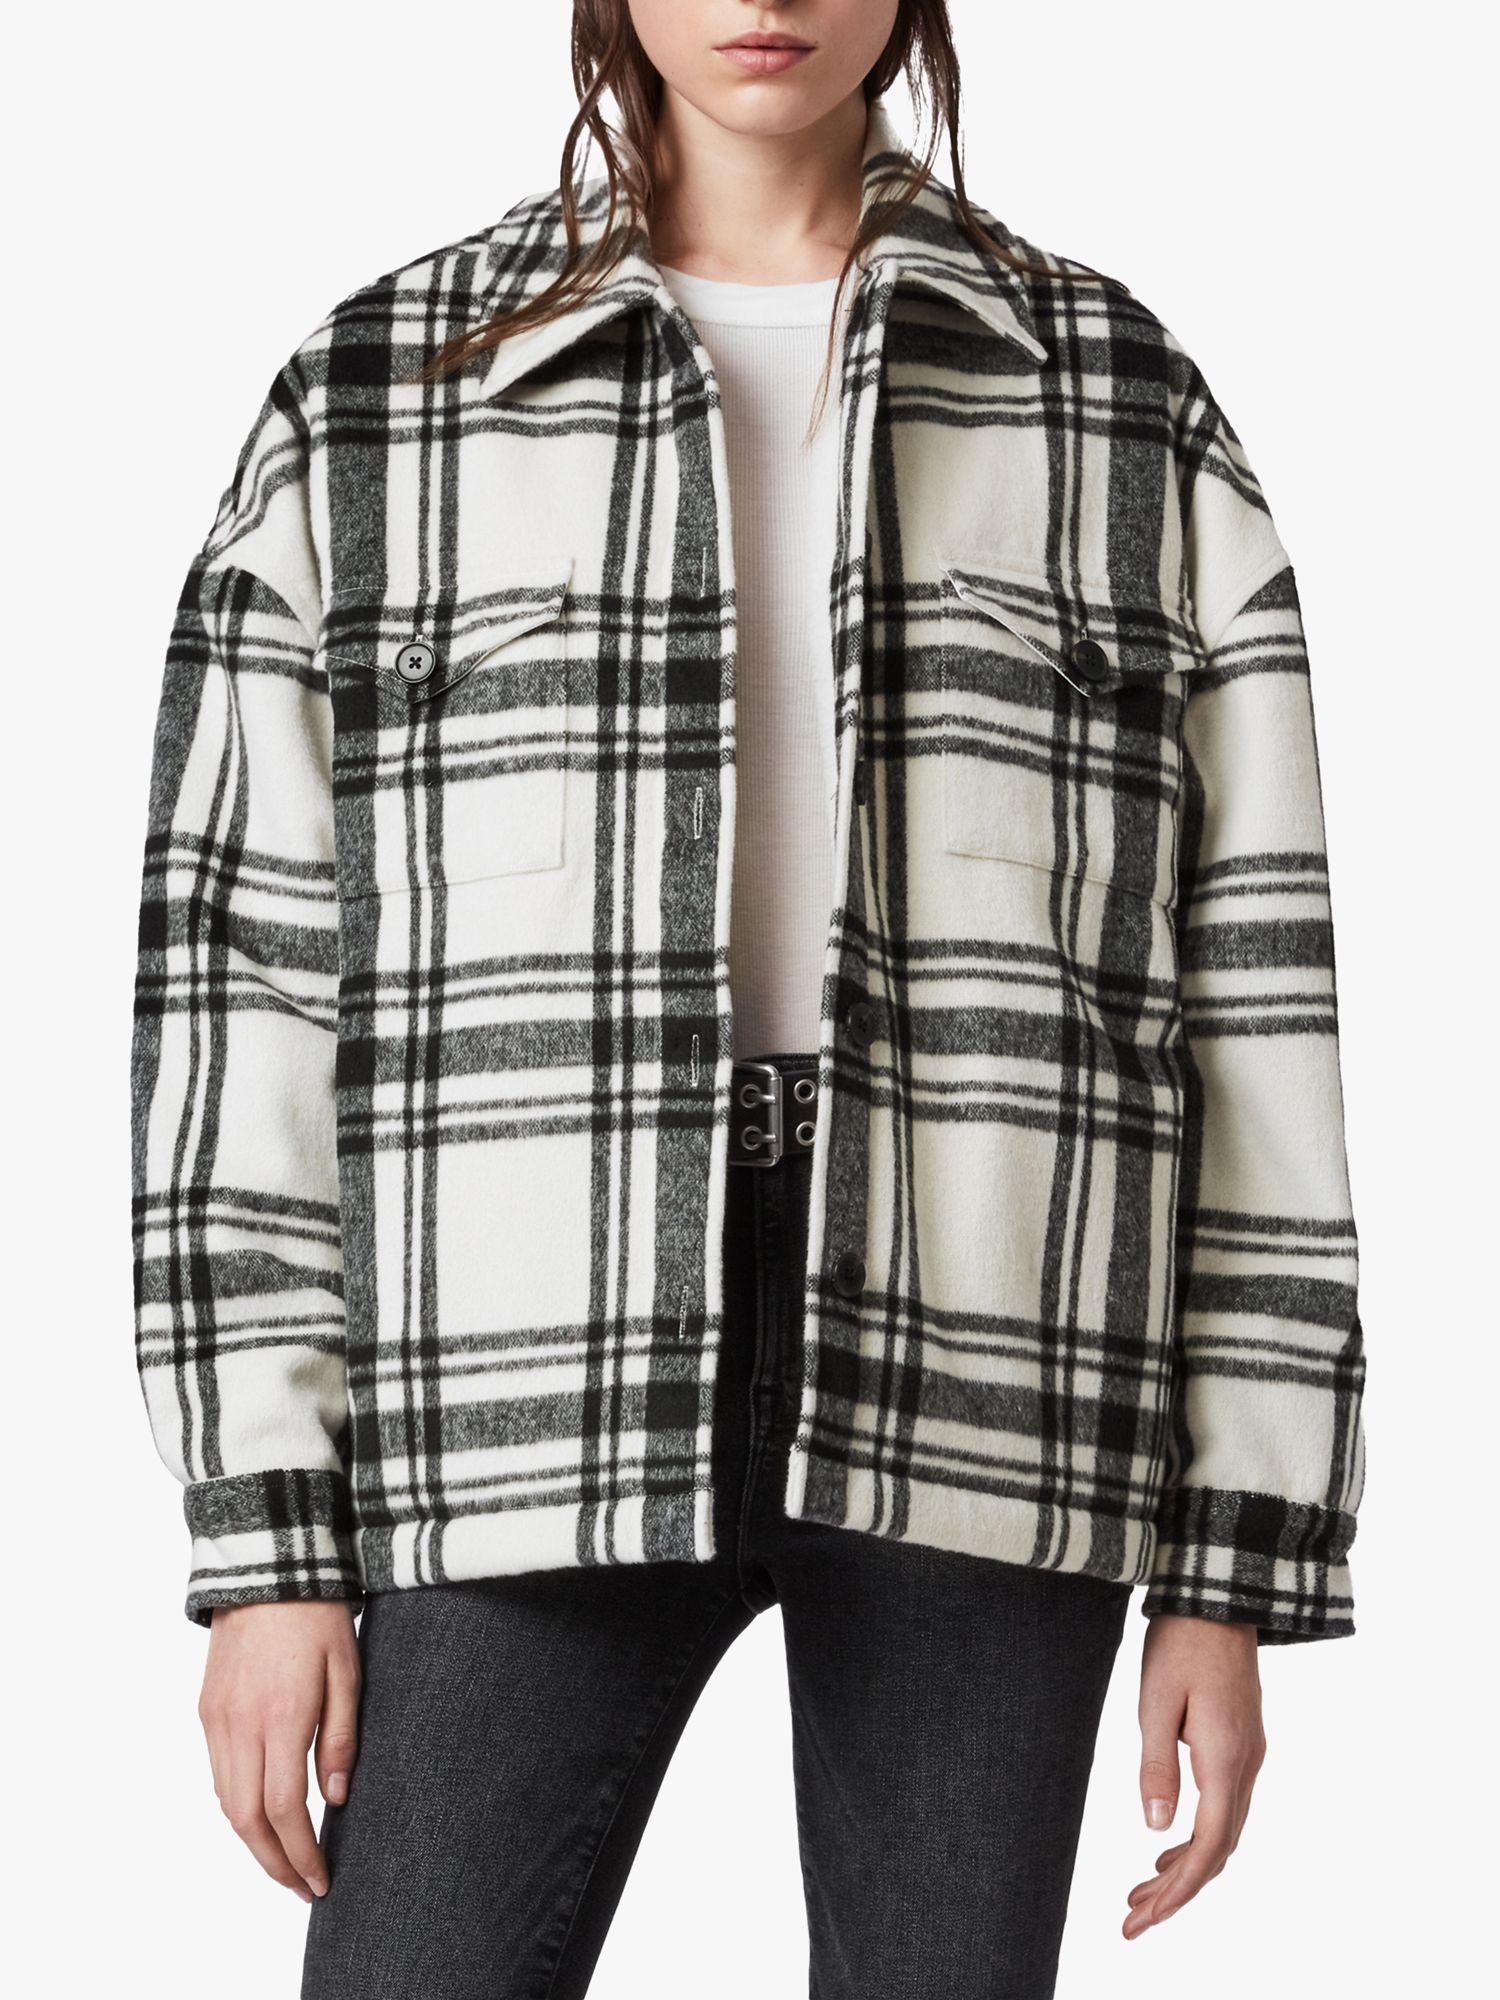 AllSaints AllSaints Luella Check Jacket, Off White/Black